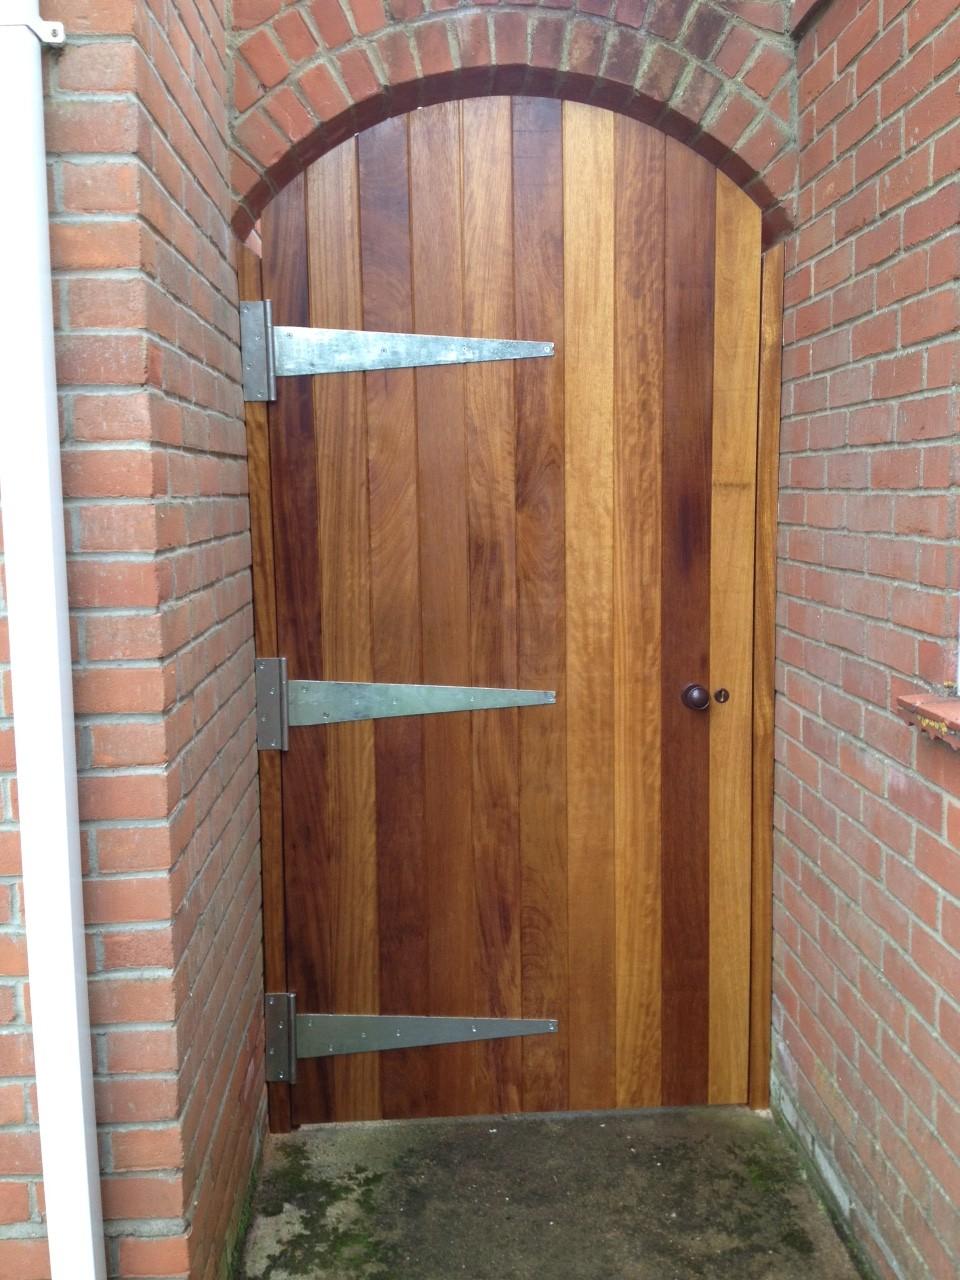 Bespoke Gate Design and Build, Sudbury, Suffolk, East Anglia